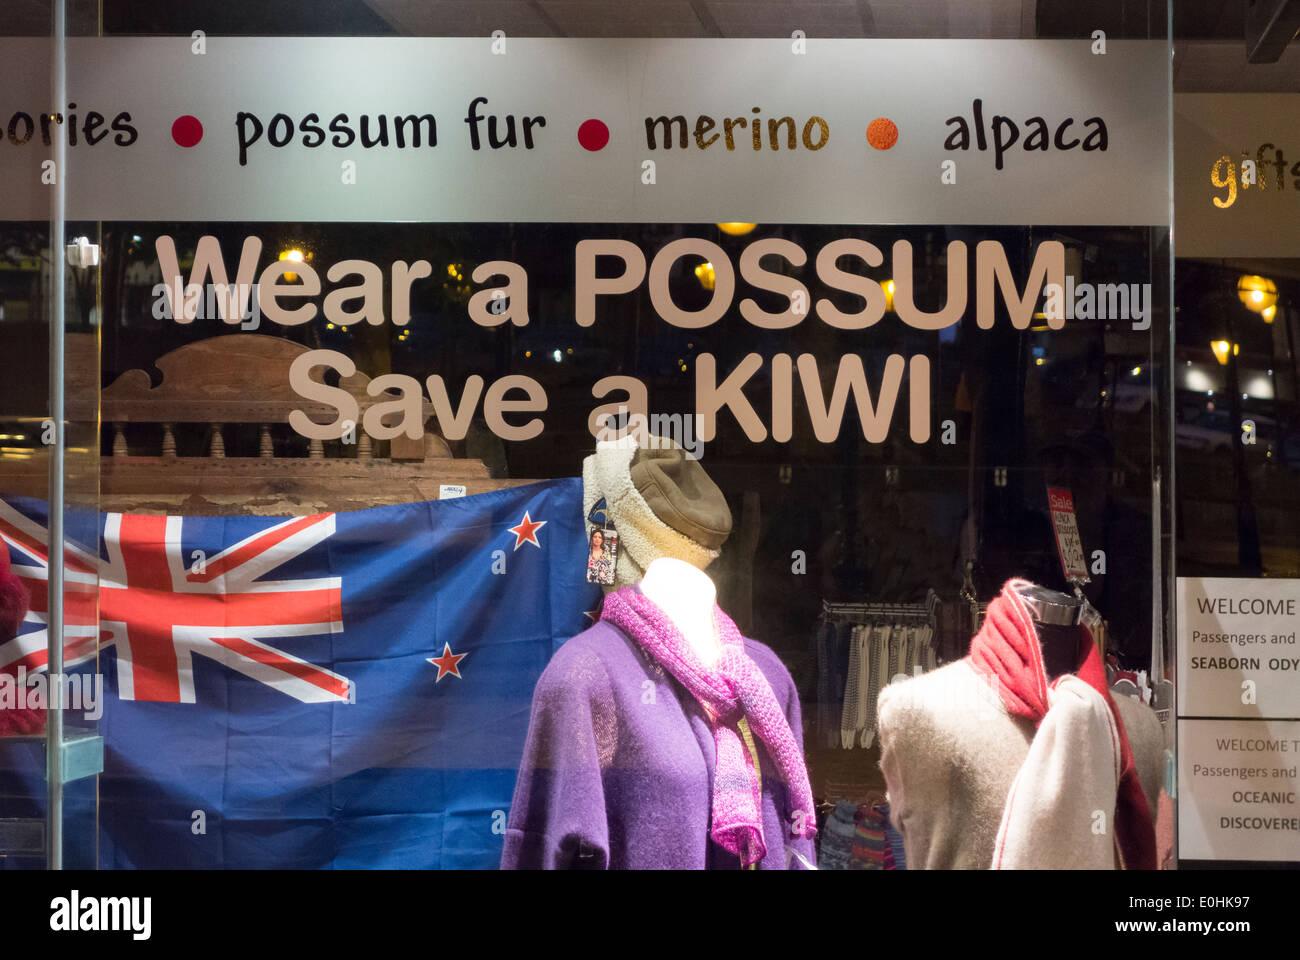 https://c7.alamy.com/comp/E0HK97/wear-a-possum-save-a-kiwi-shop-window-in-dunedin-new-zealand-promoting-E0HK97.jpg